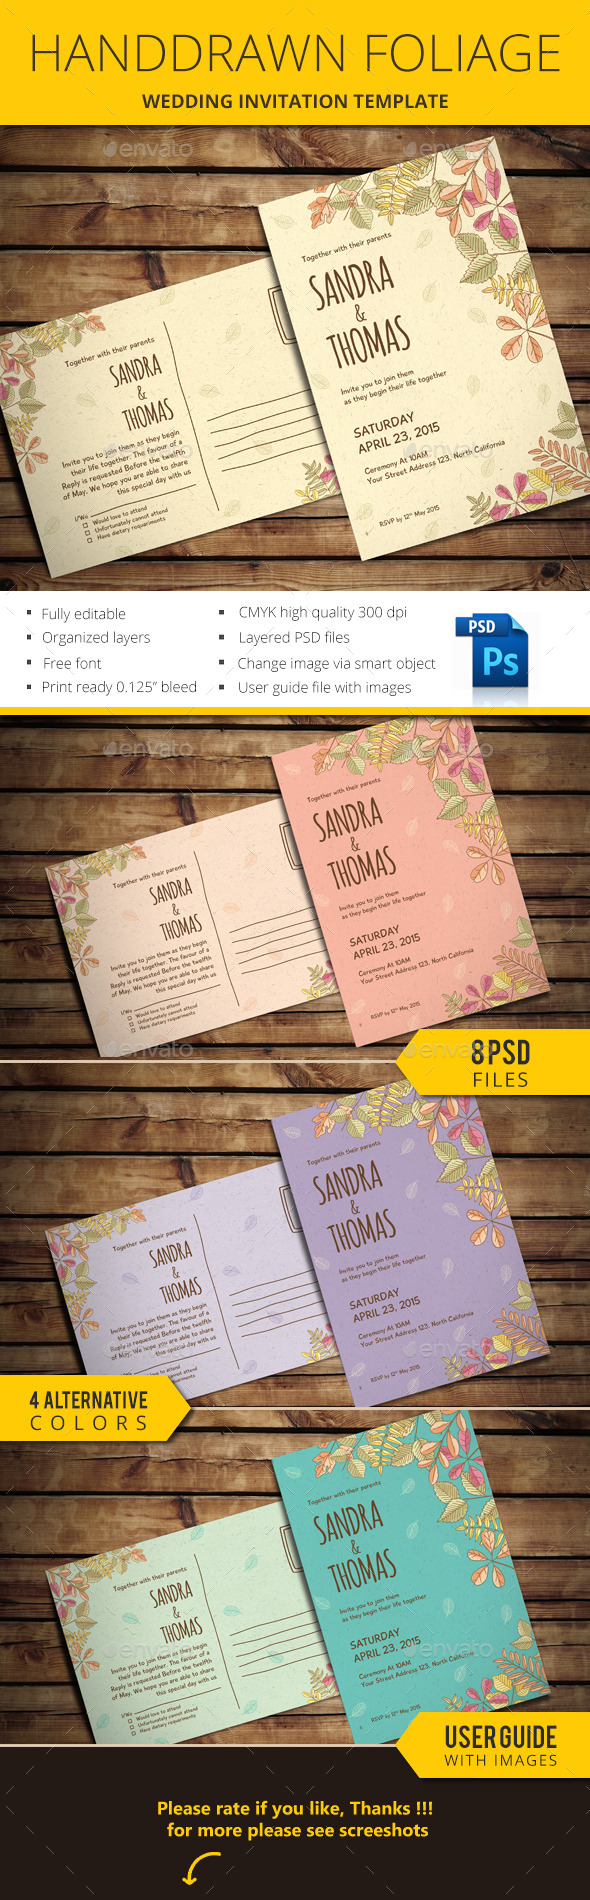 Handdrawn Foliage Wedding Invitation - Invitations Cards & Invites